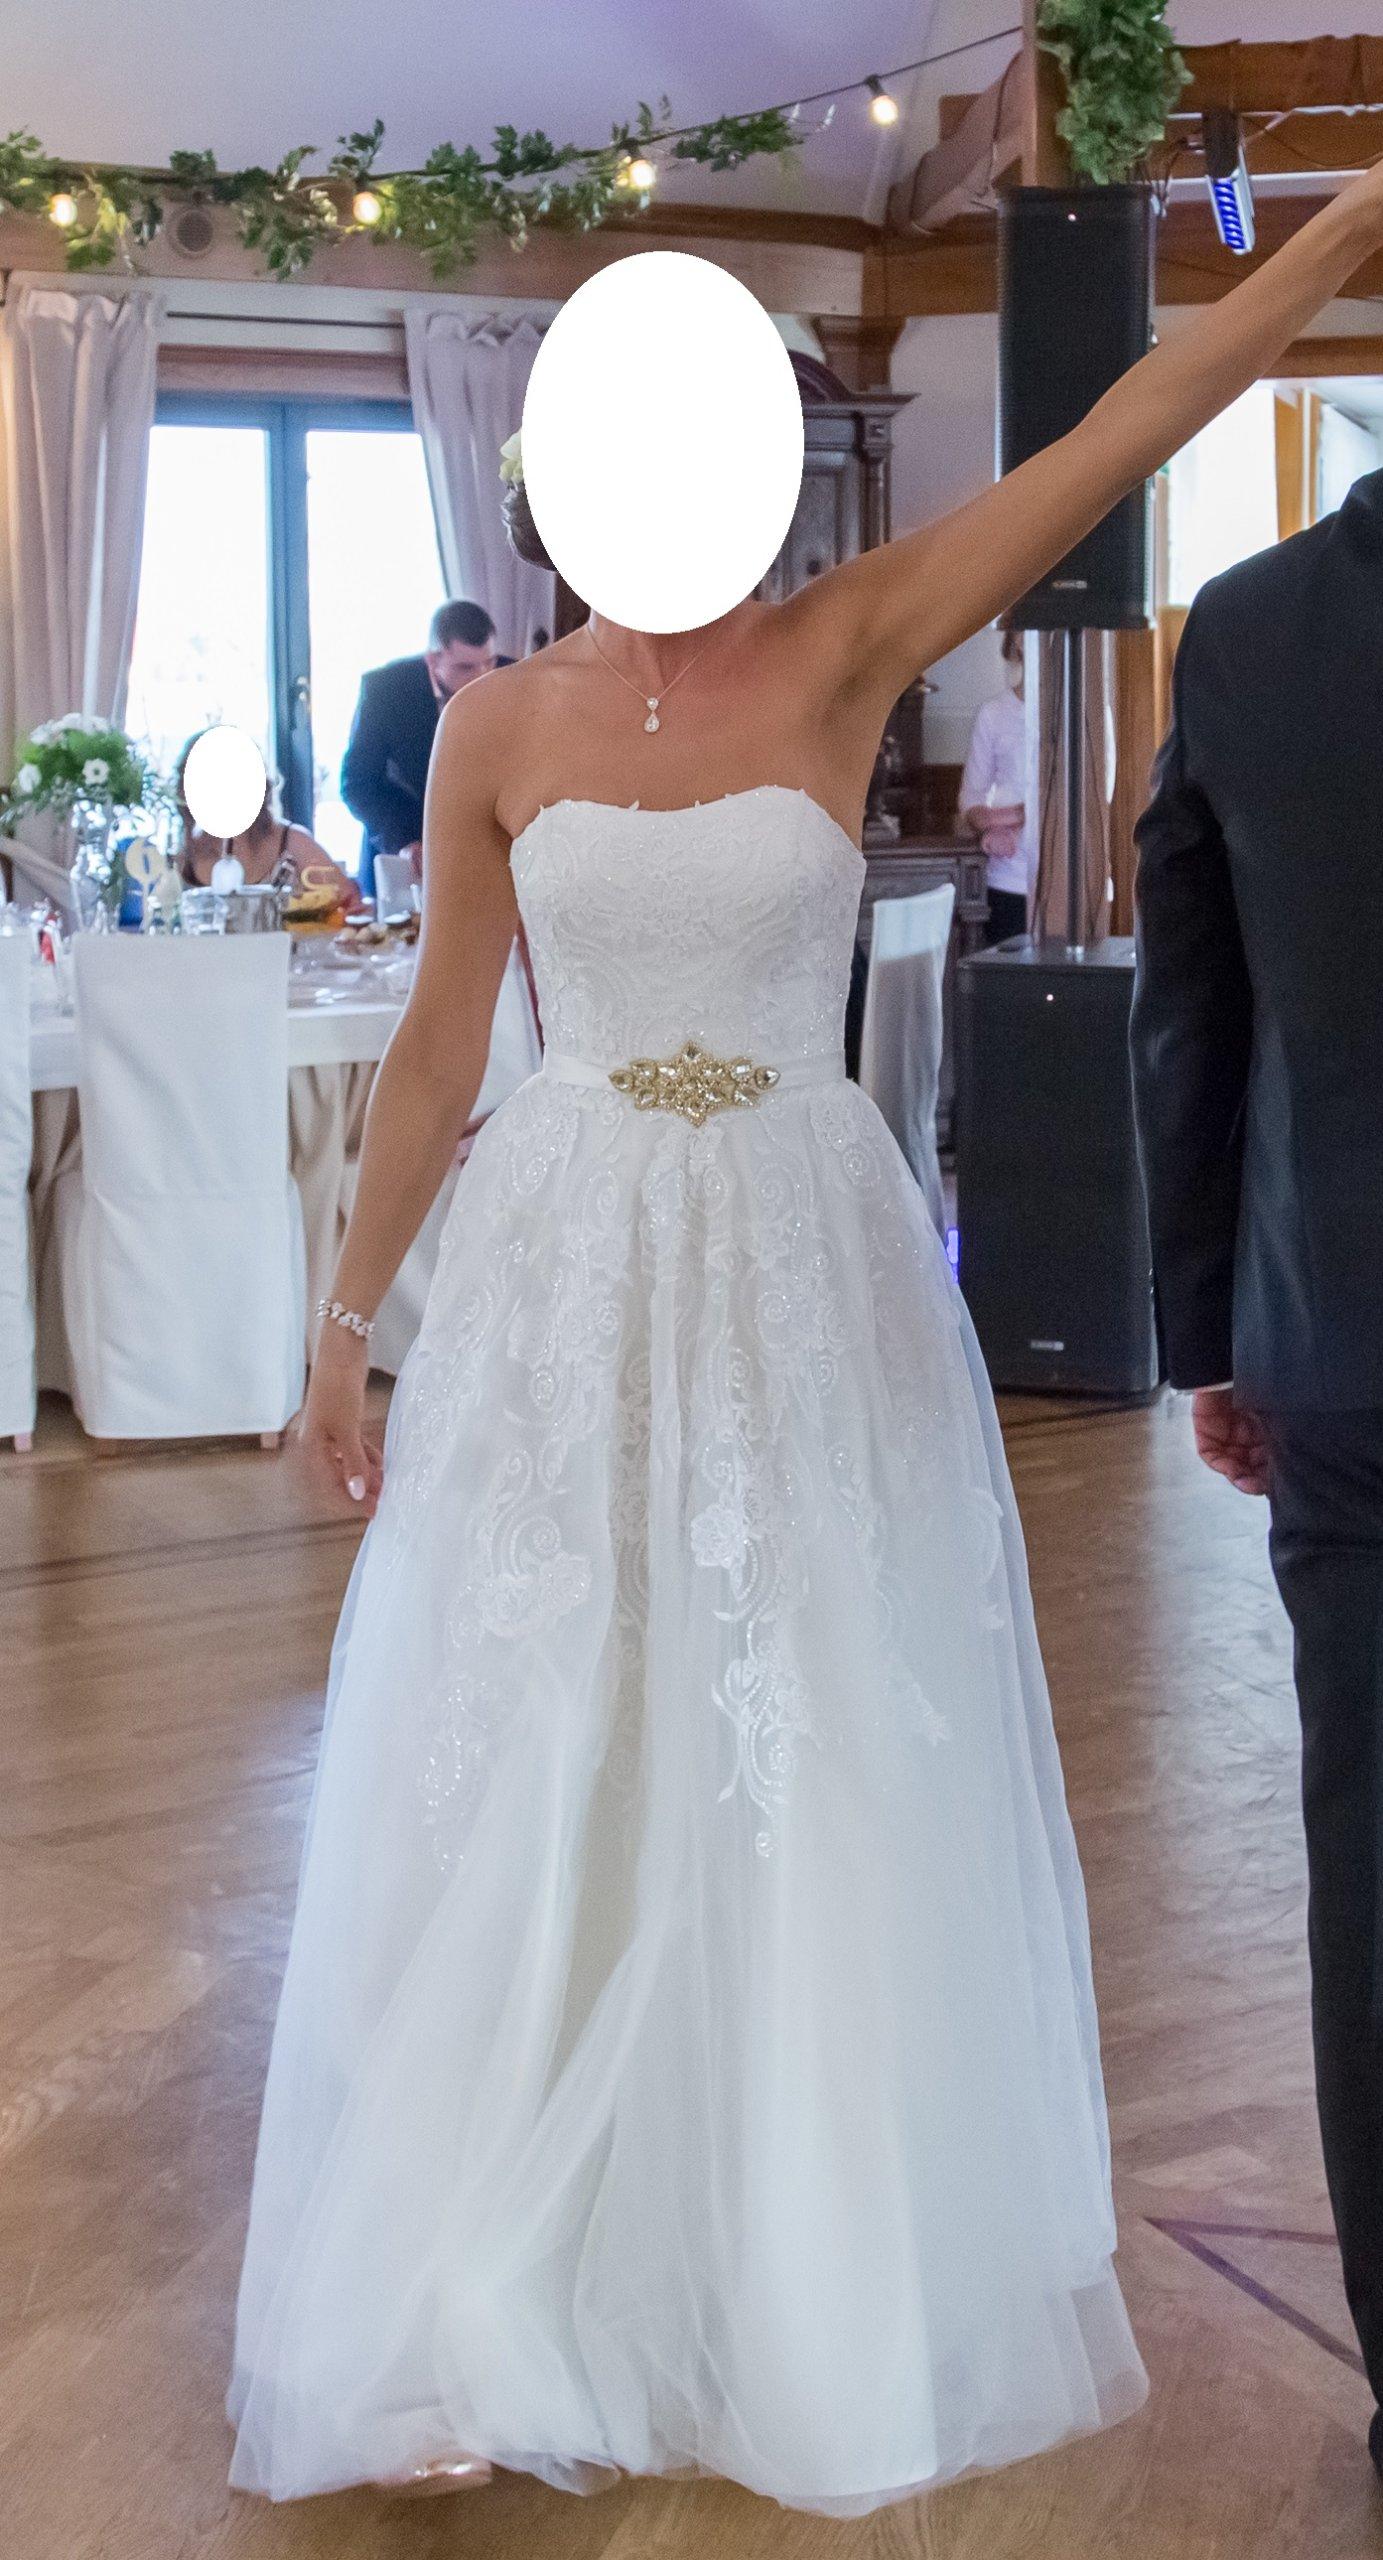 Suknia ślubna Z Usa Hiszpańska Koronka Styl Boho 7349337910